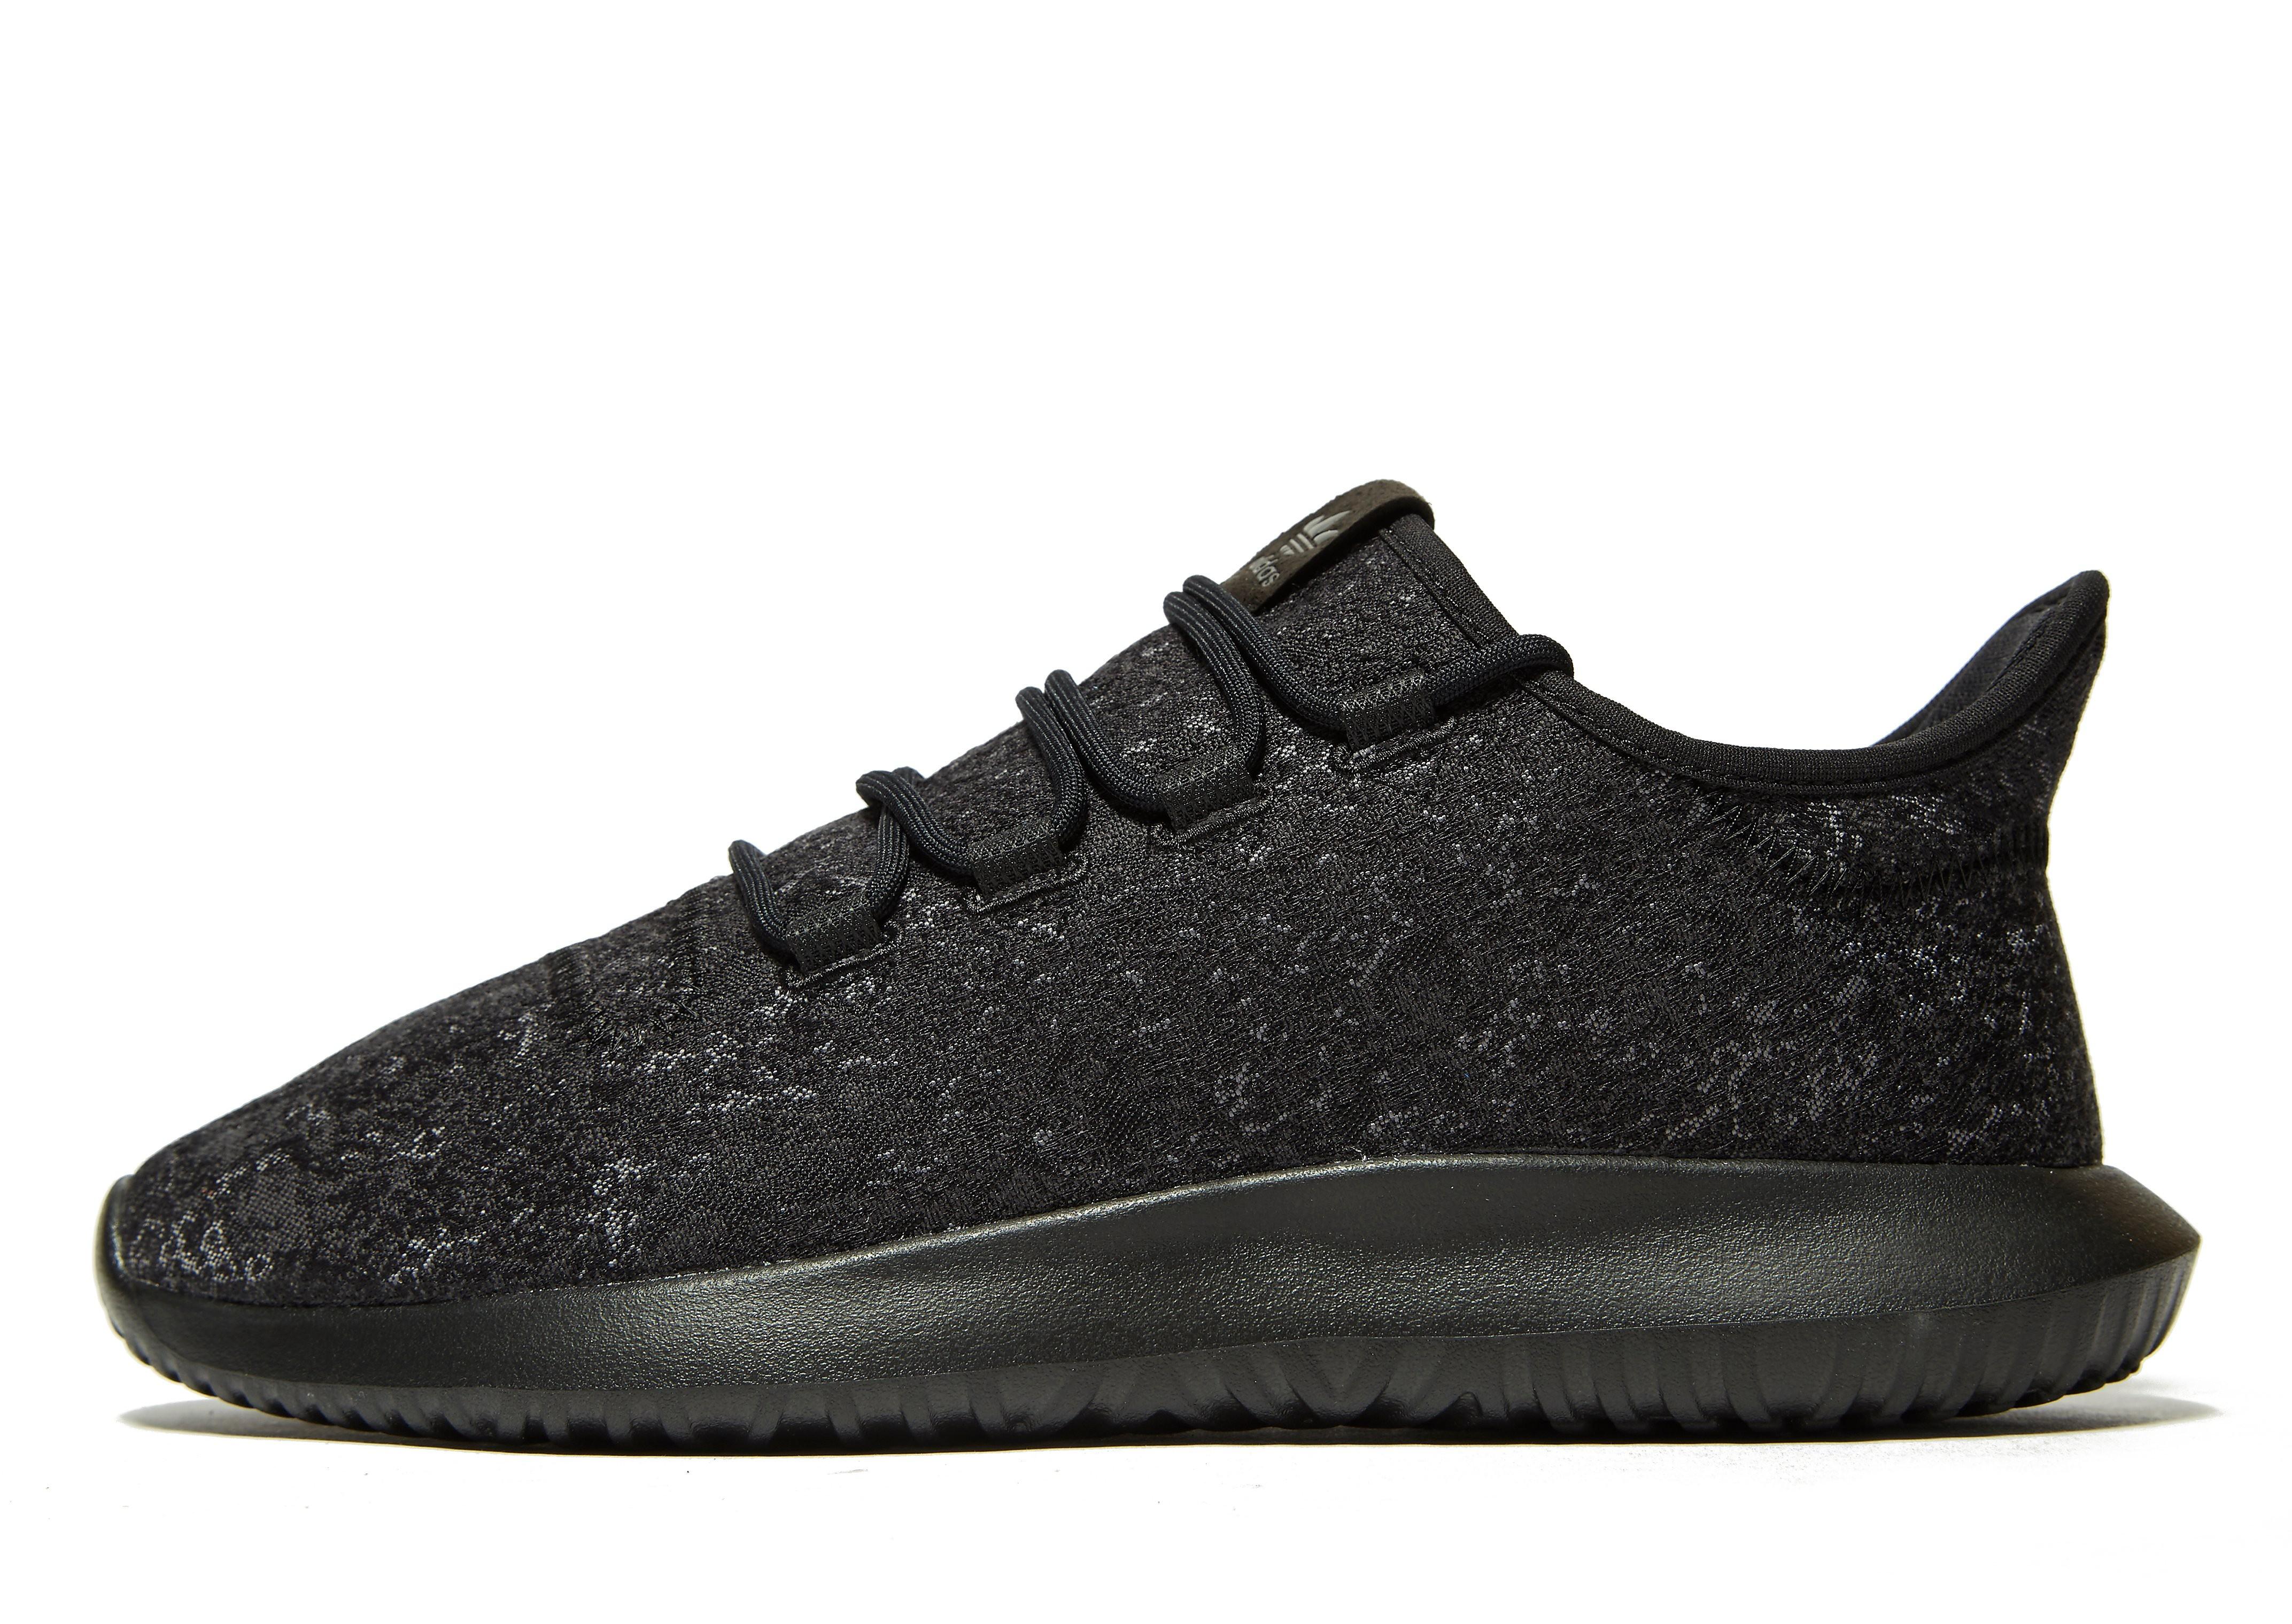 Precios de adidas tubulare ombra negras - 46 baratos ofertas